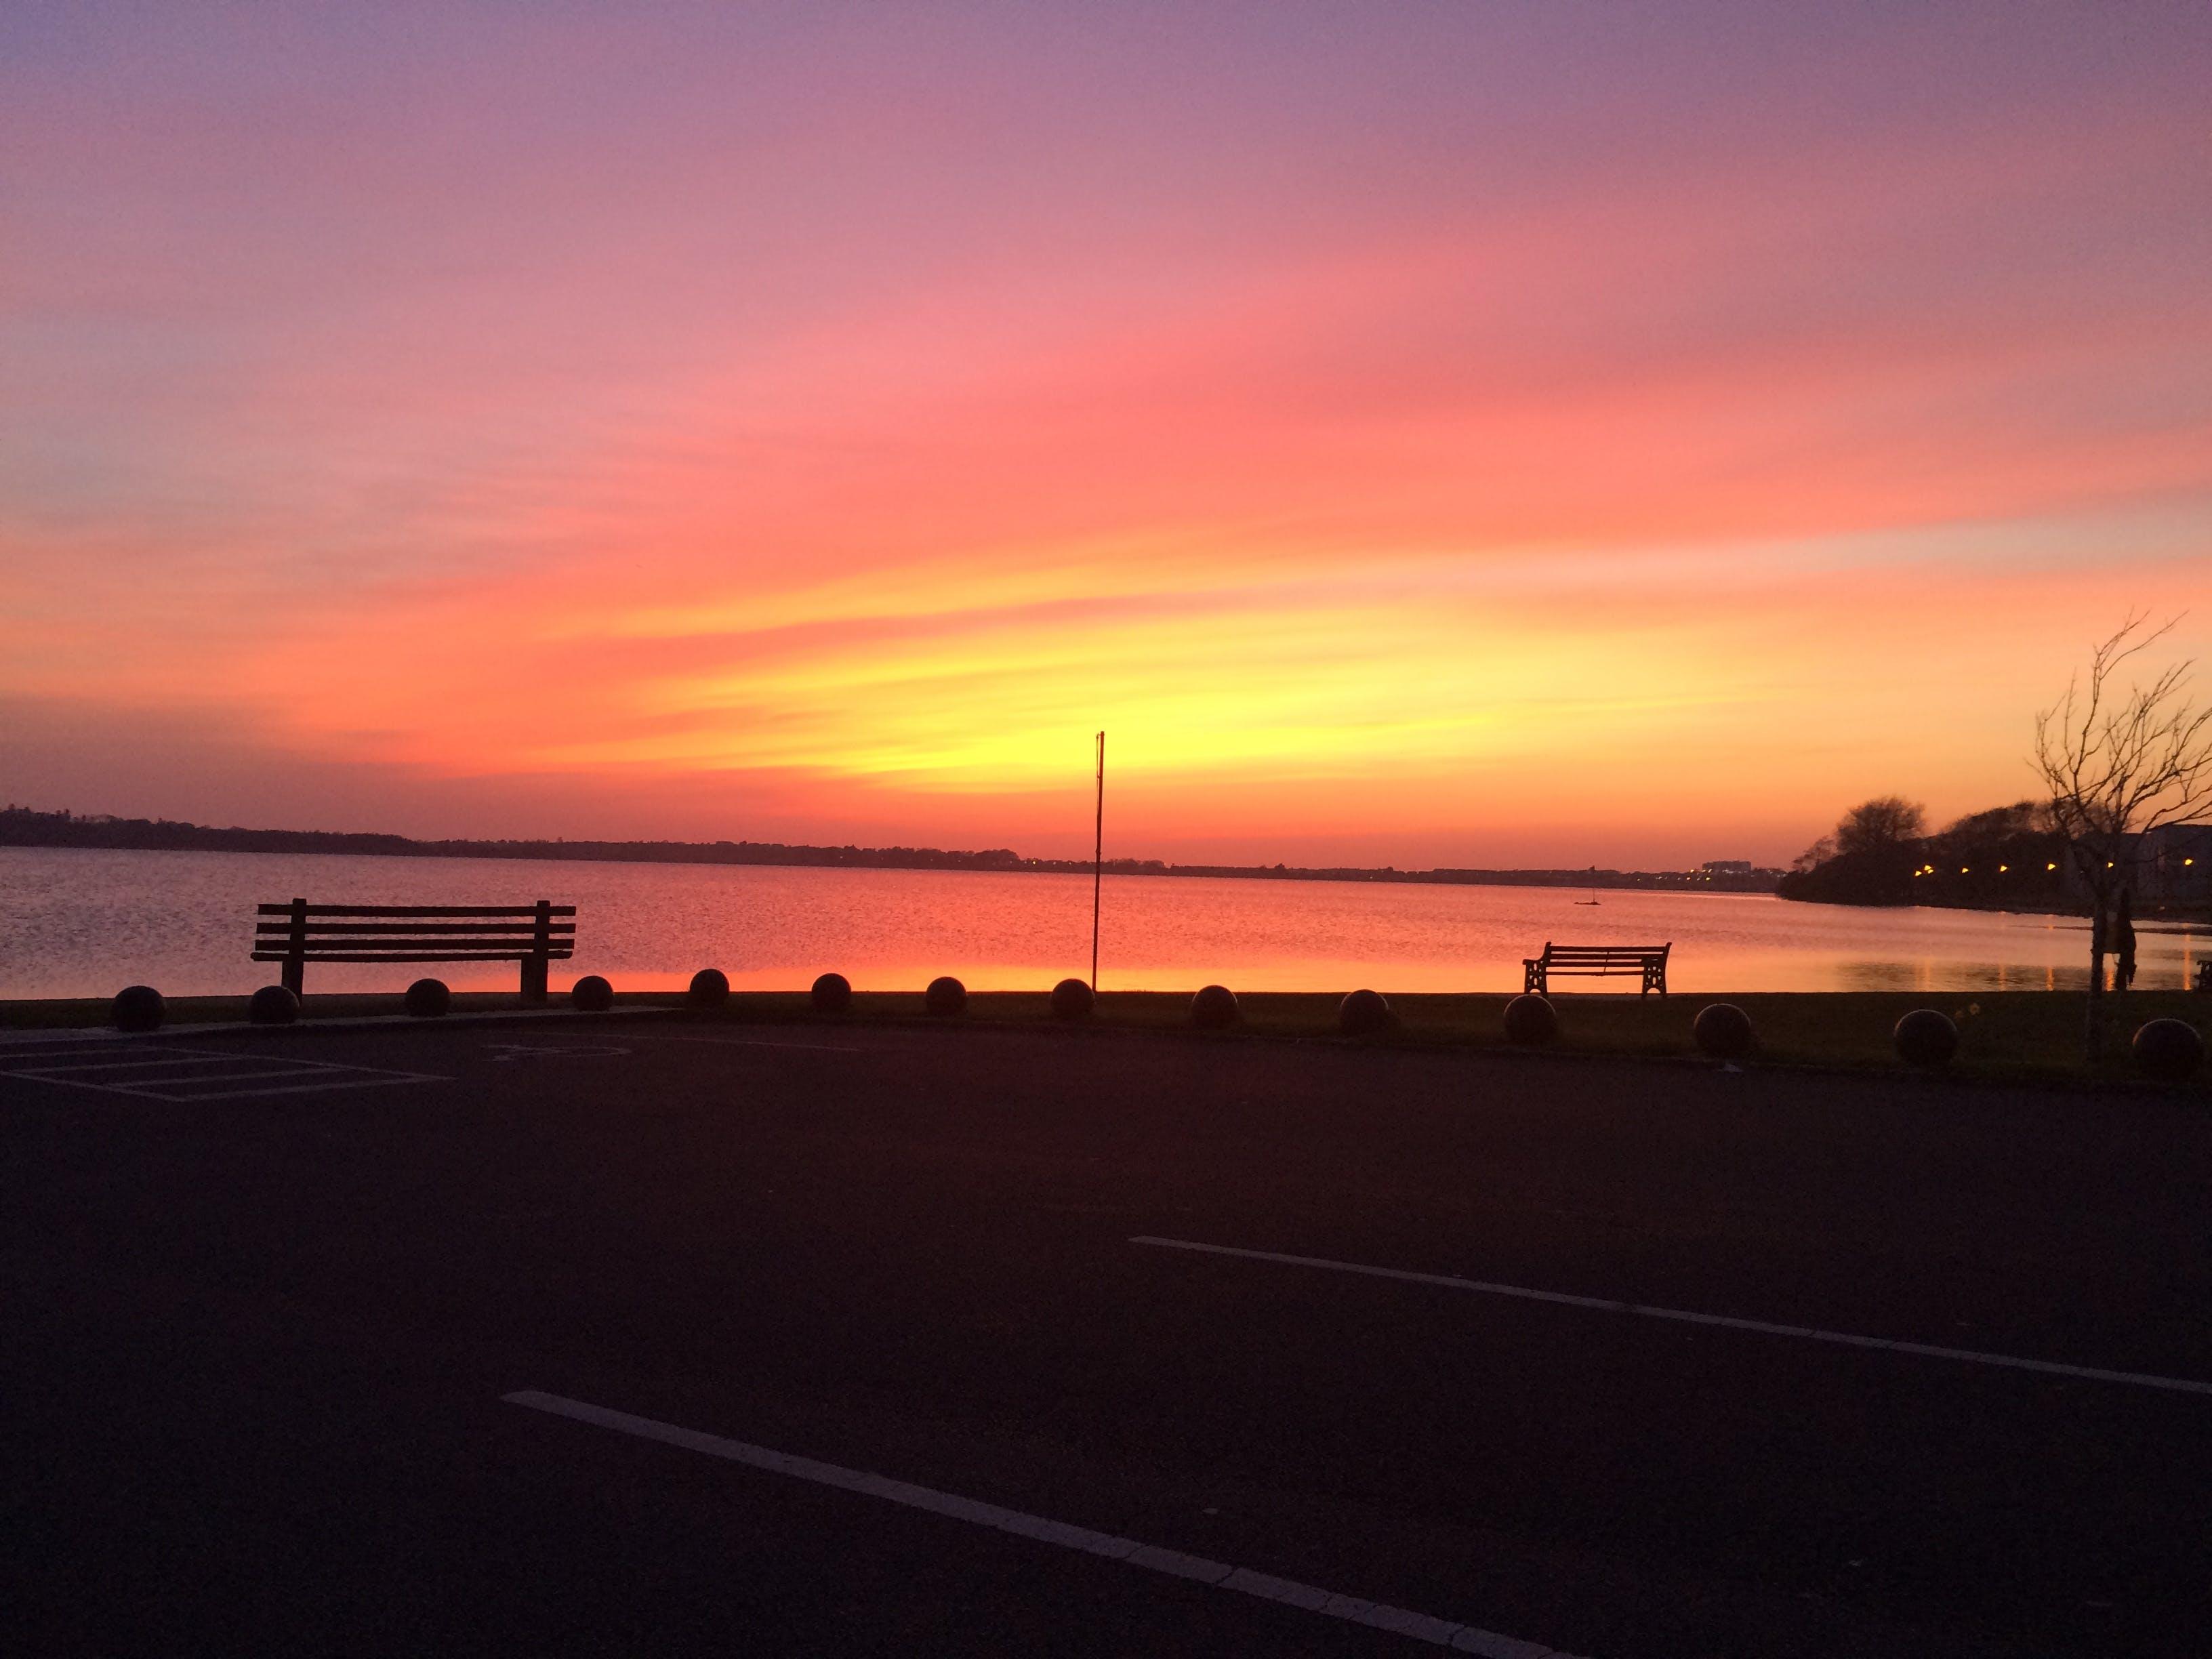 Free stock photo of bench, sunset, lake, orange